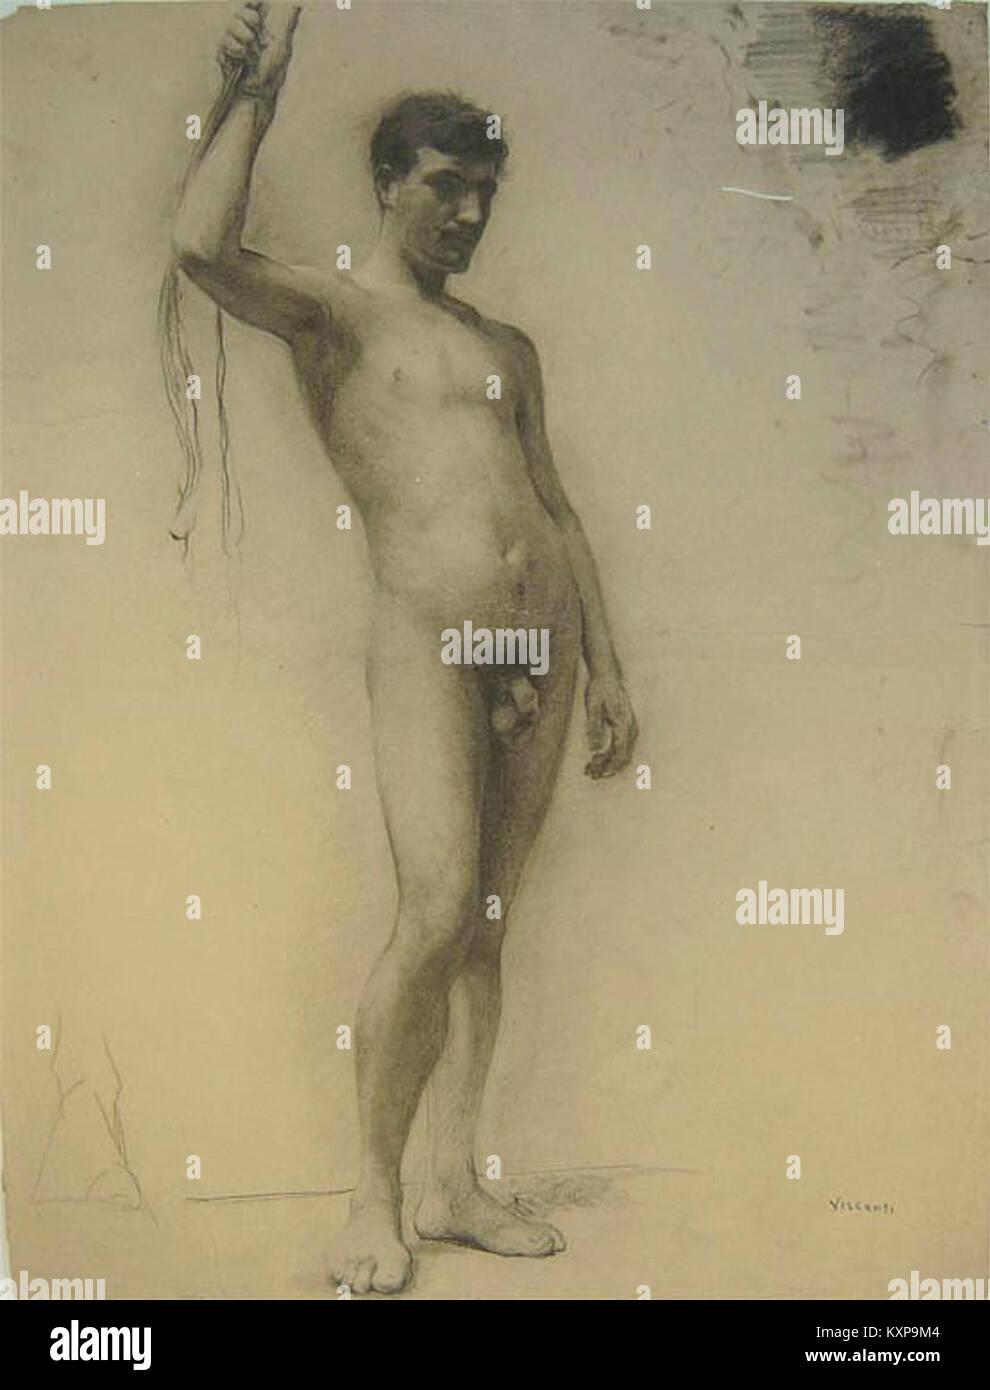 Eliseu Visconti - Nu masculino de pé c. 1889 Imagen De Stock